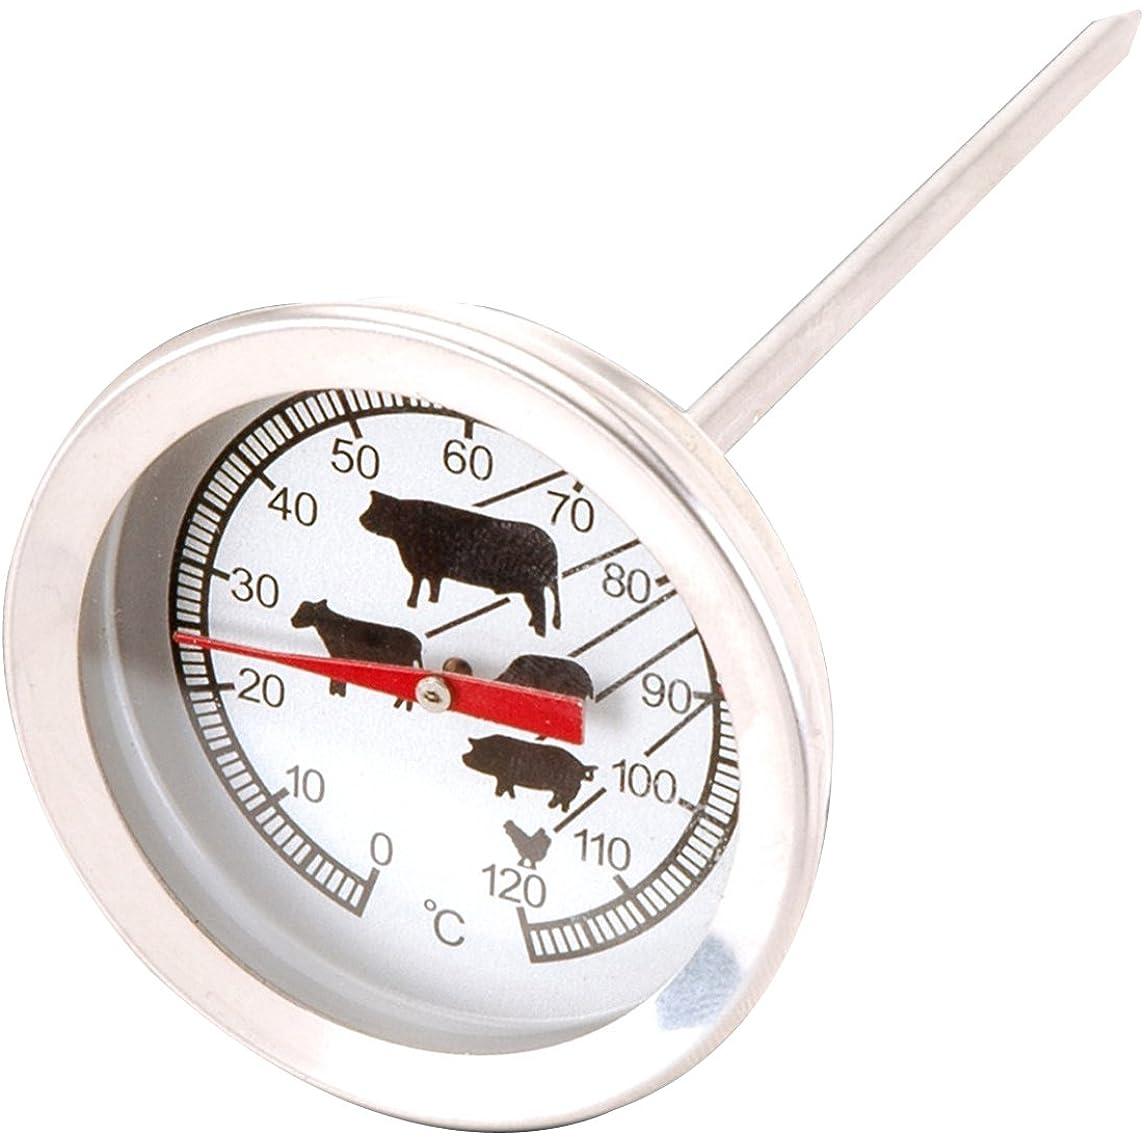 Koopman Bratenthermometer